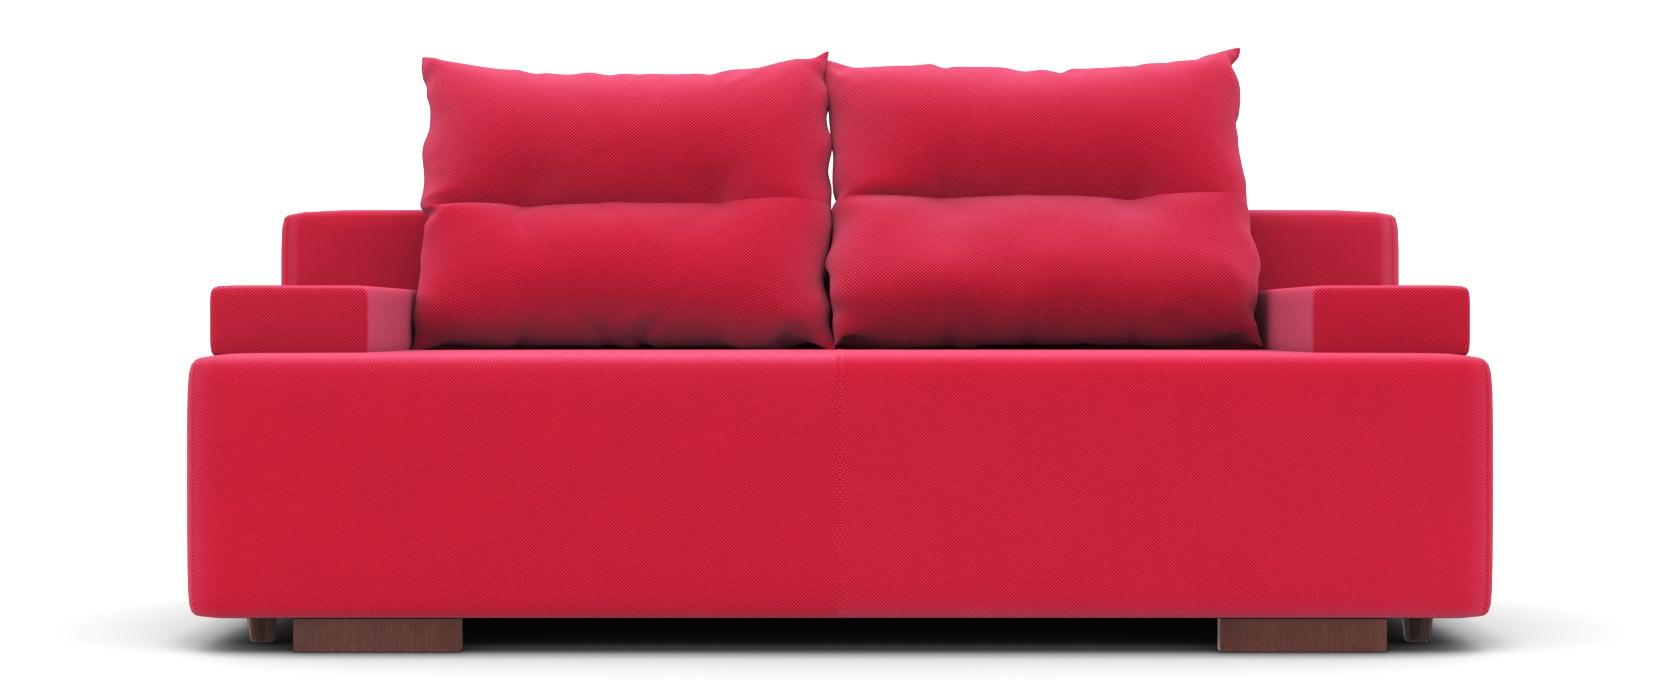 Тримісний диван Marta - Pufetto